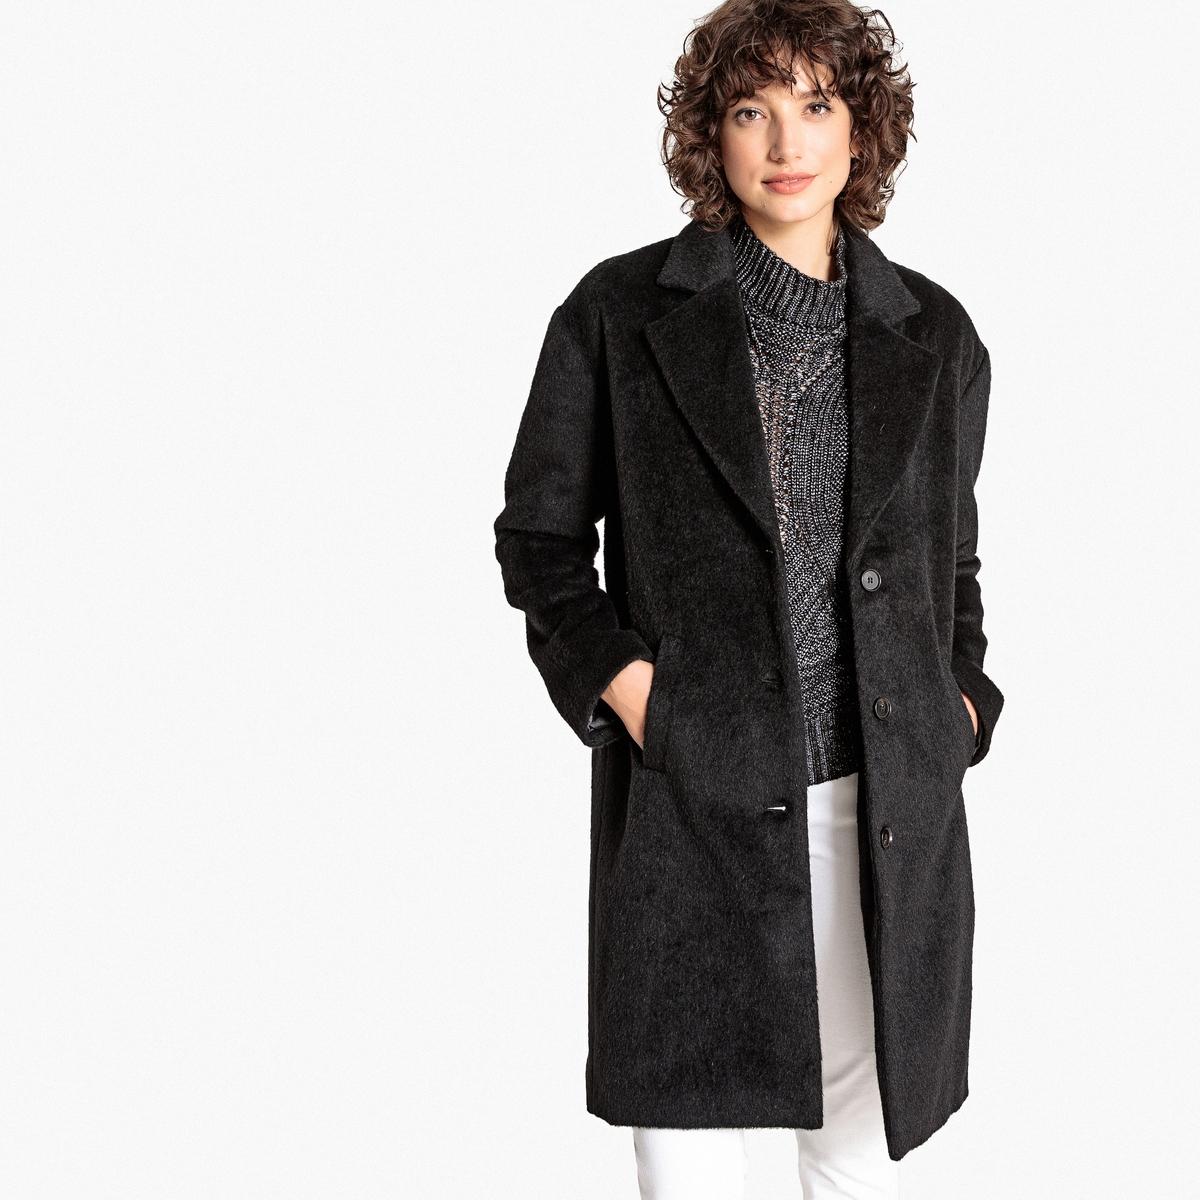 Abrigo de lana mezclada con corte amplio